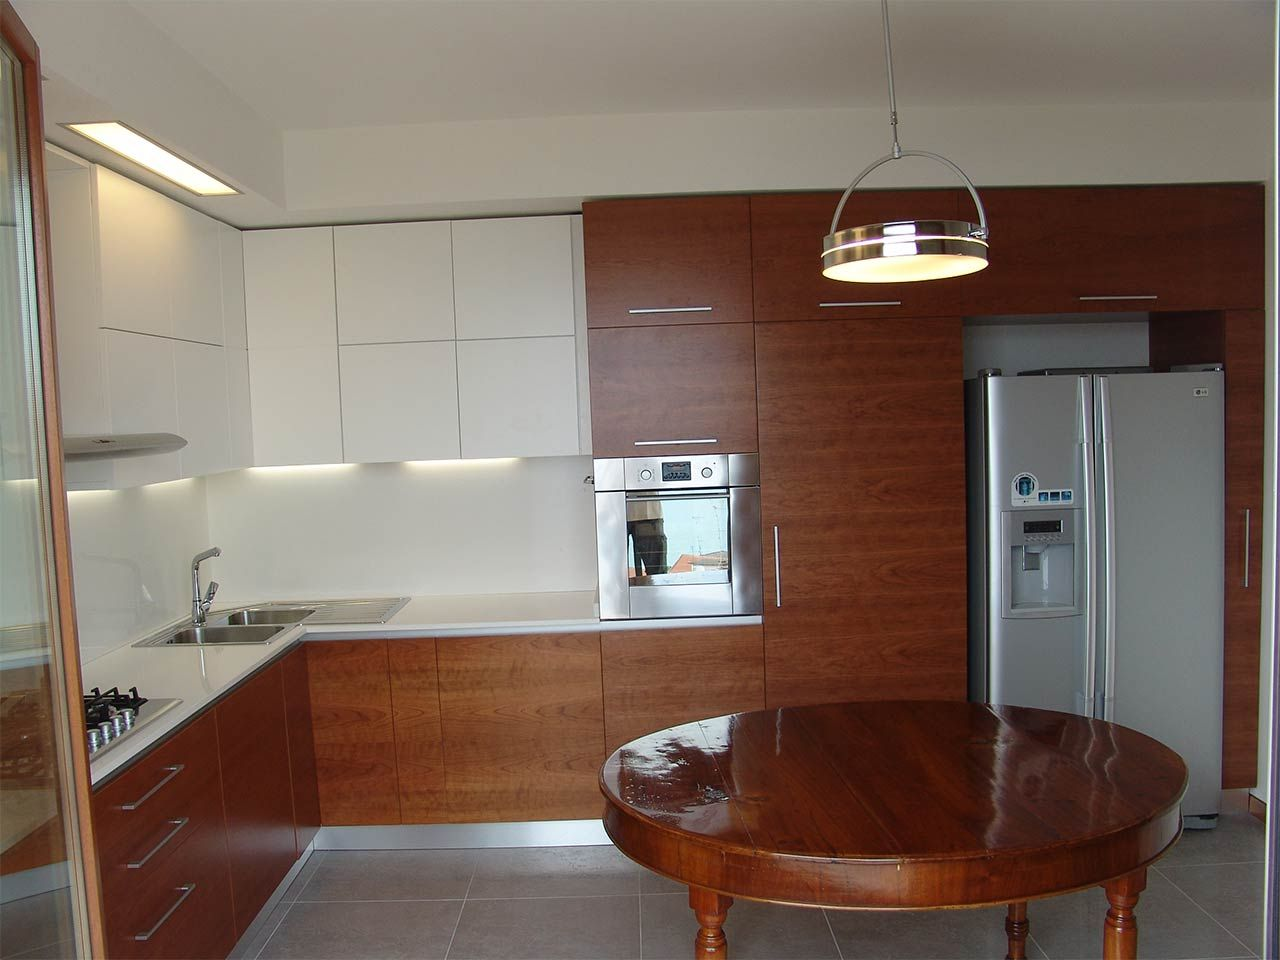 Cucina in ciliegio e bianco opaco by casa nel 2019 pinterest - Silvana in cucina ...